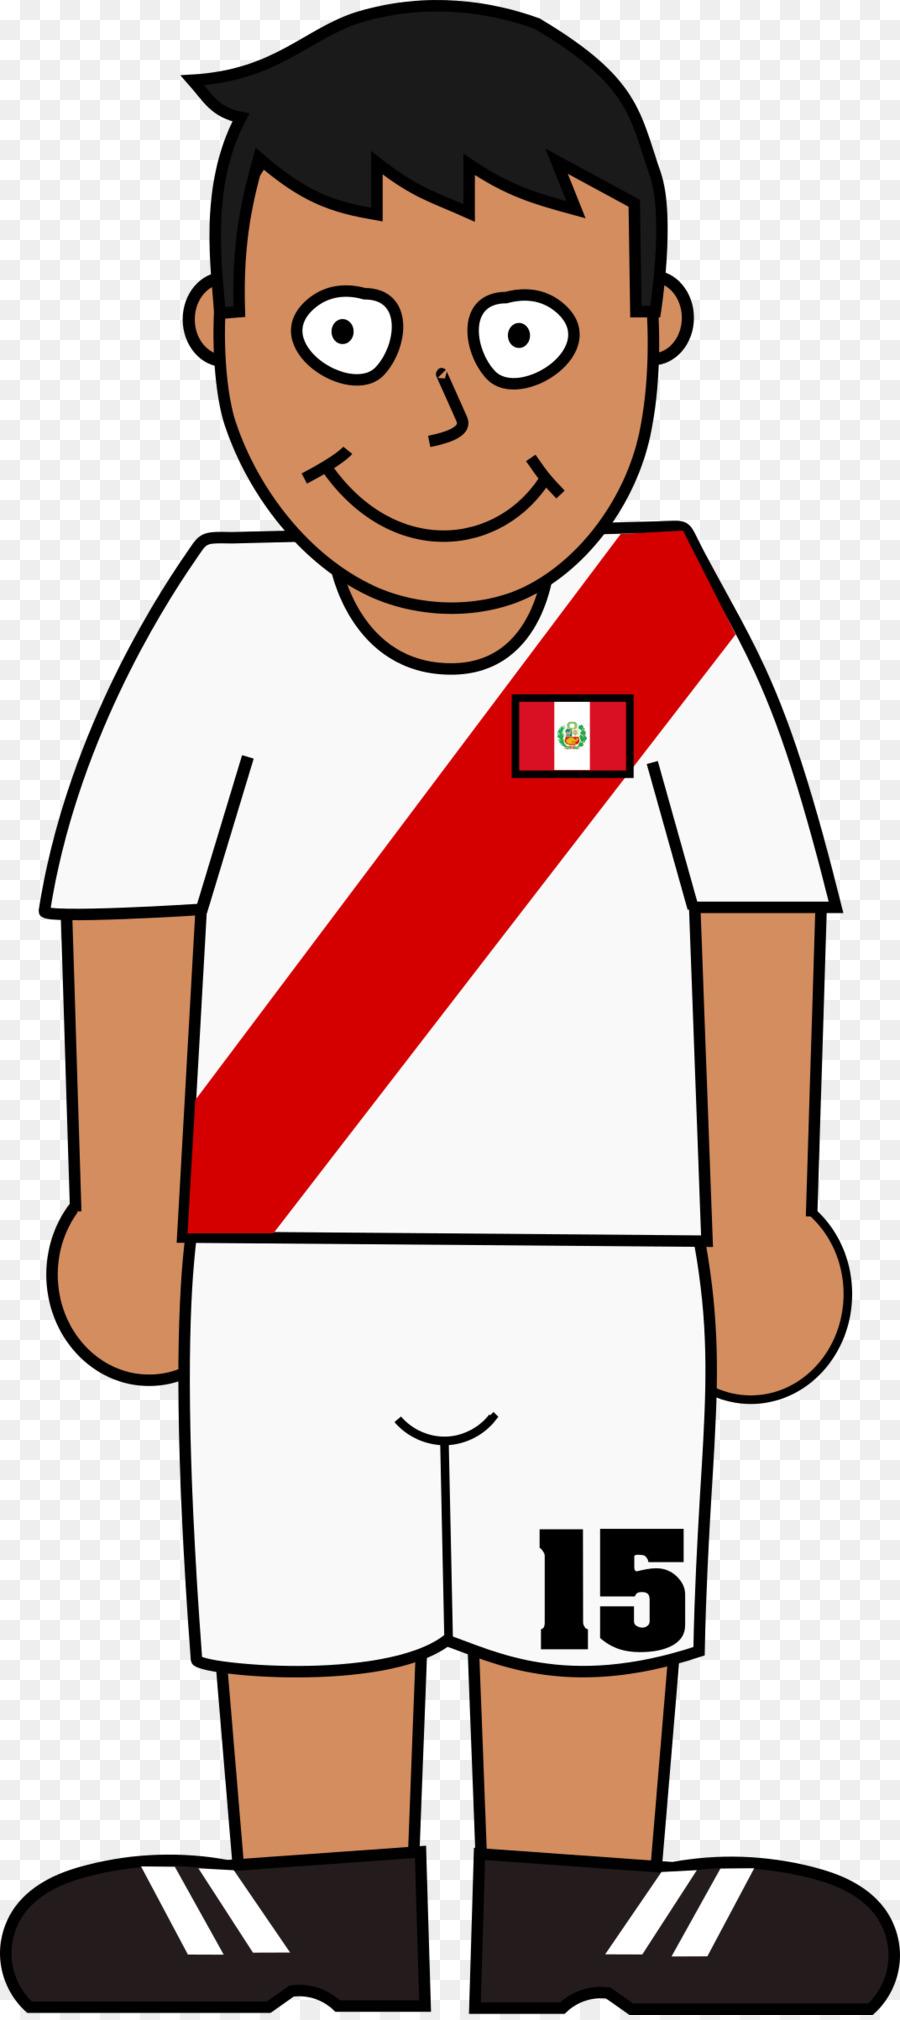 2018 World Cup 2014 FIFA World Cup Clip art Football player.